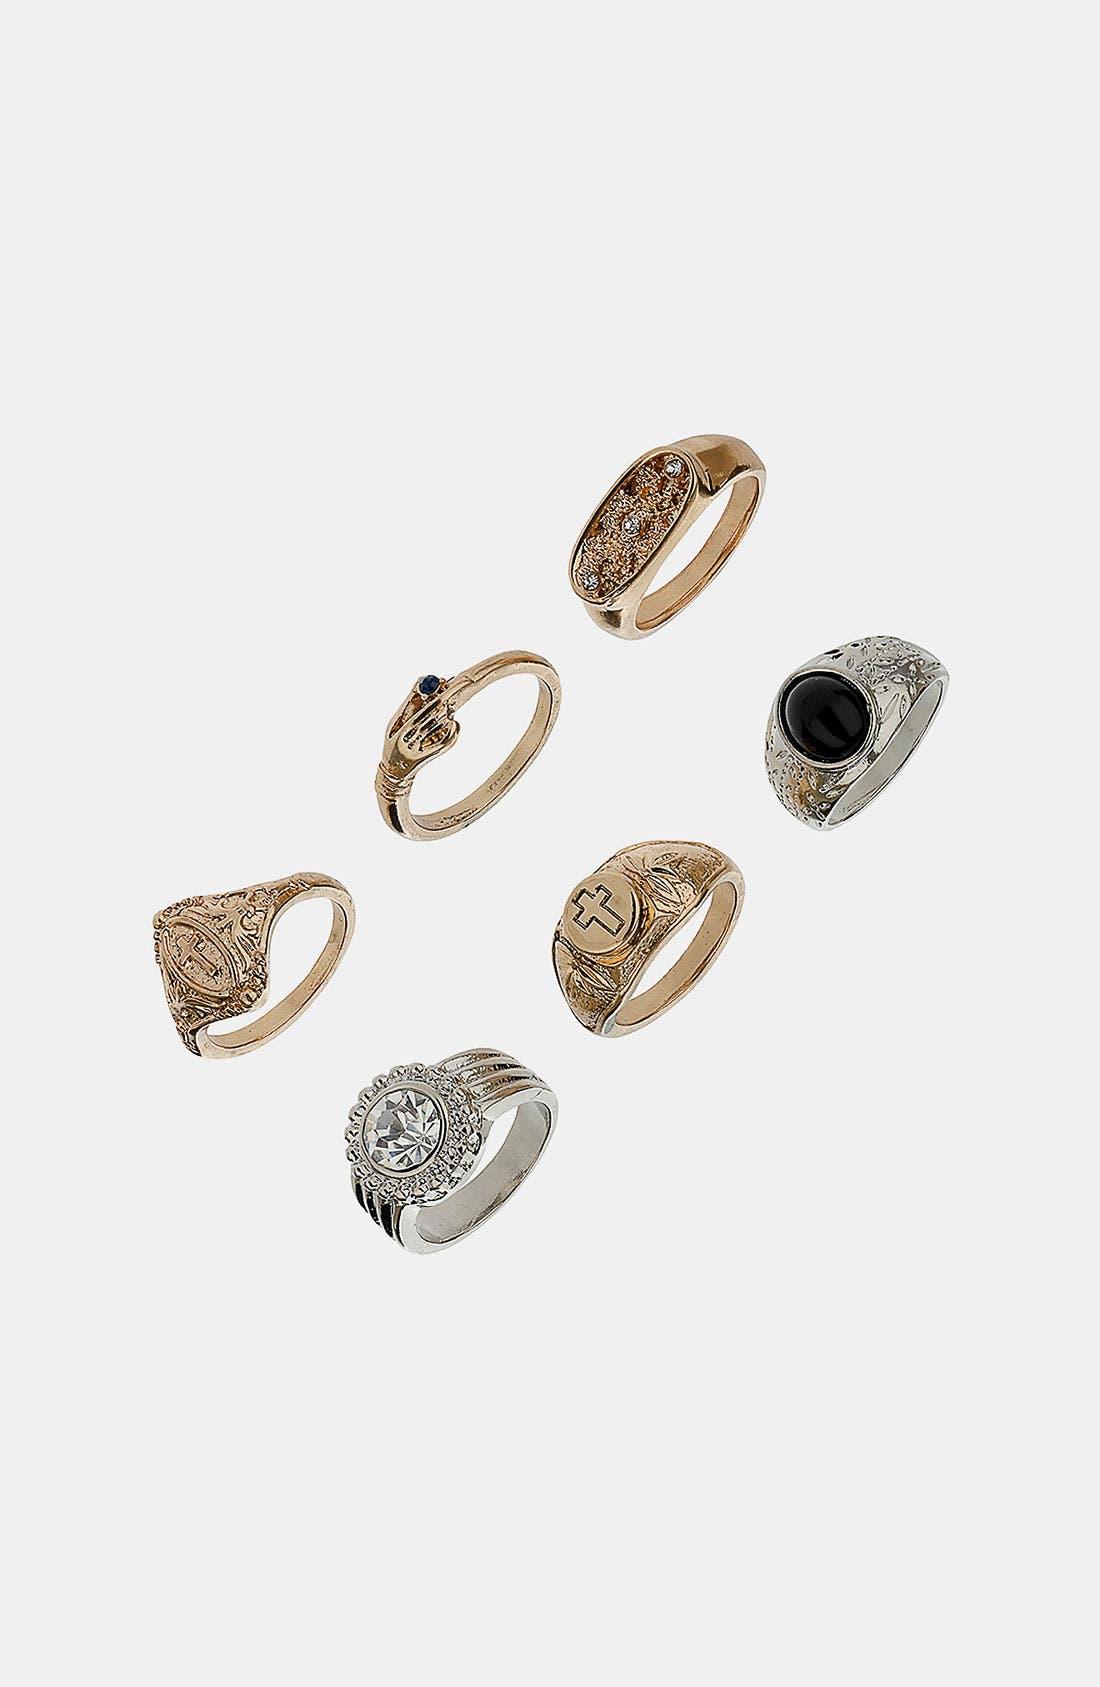 Main Image - Topshop 'Rococo' Rings (Set of 6)